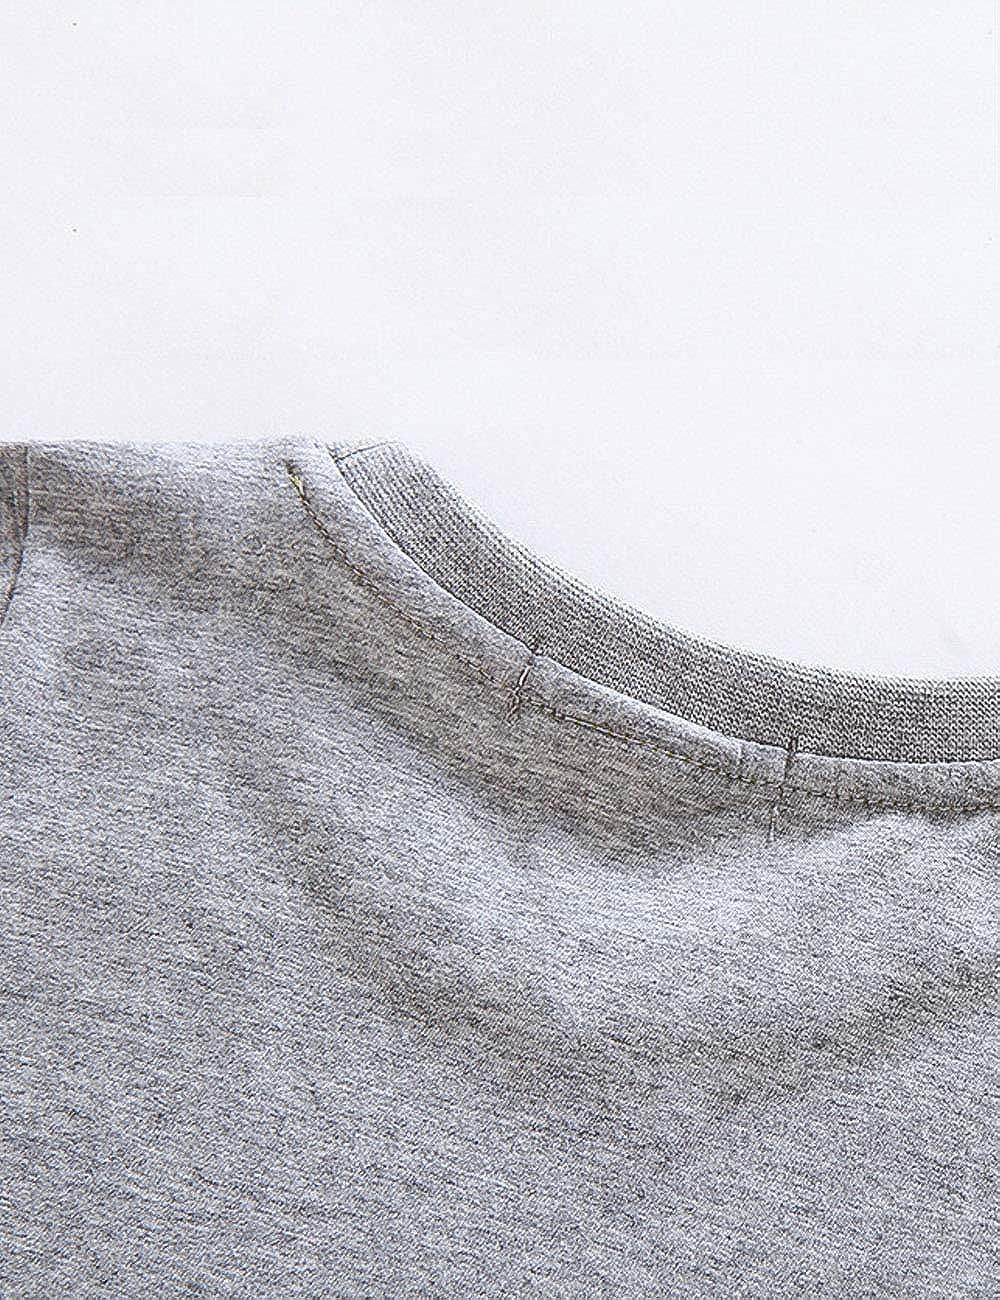 Brawl Stars Camiseta Ni/ños Camiseta y Pantalon Brawl Stars Personajes 3D Impresi/ón Ch/ándal Games Camisetas y Shorts de Verano Traje de Dos Piezas Algod/ón Camiseta Brawl Stars Ni/ño